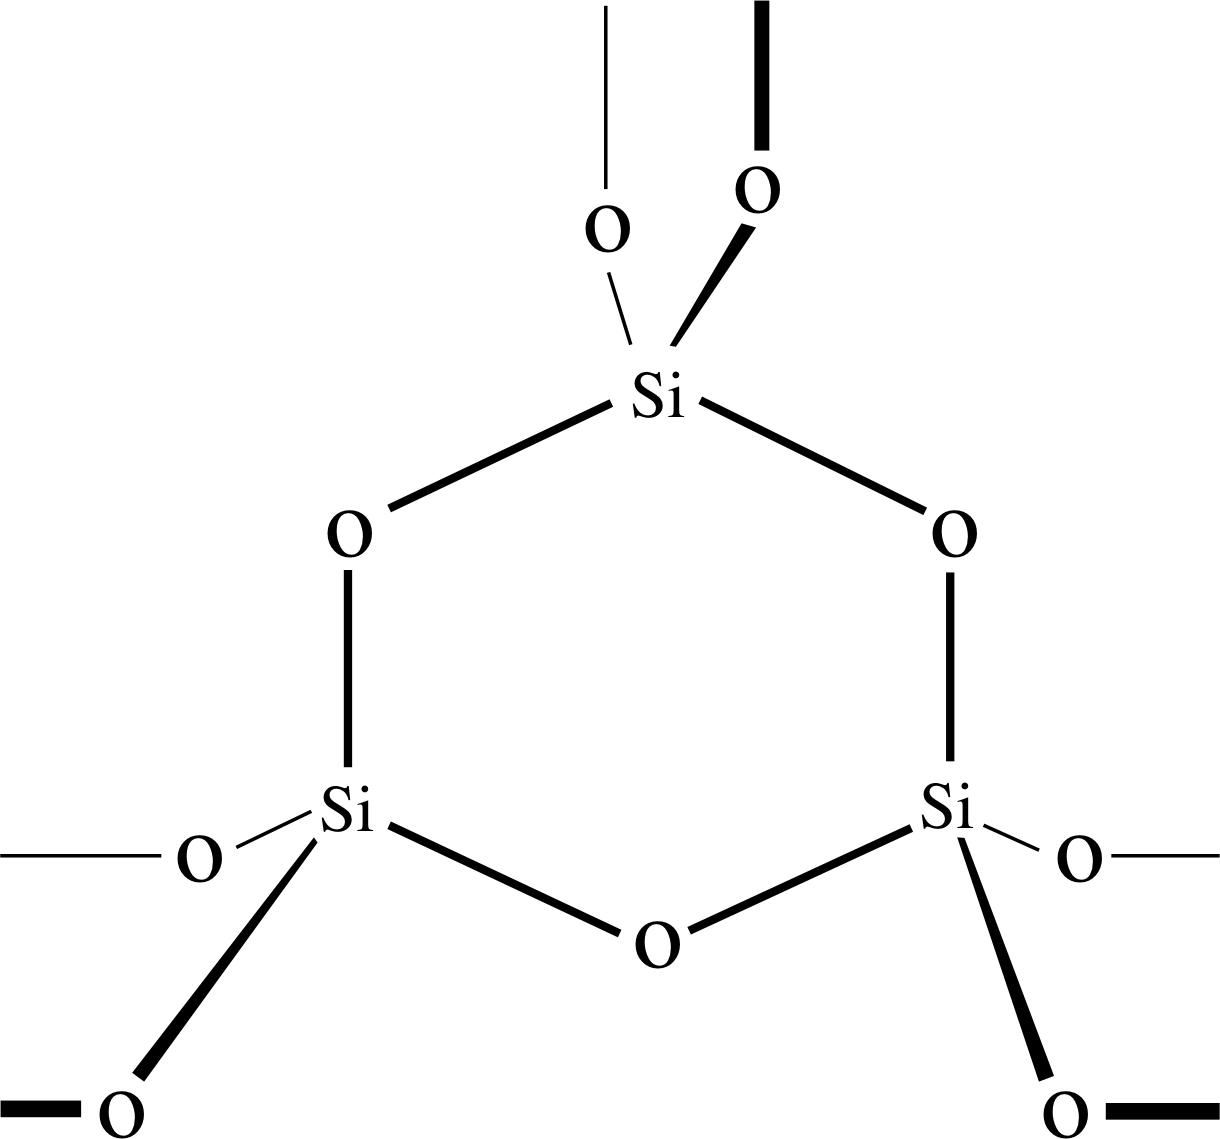 Pplato flap phys 84 the periodic table and chemical bonding figure buycottarizona